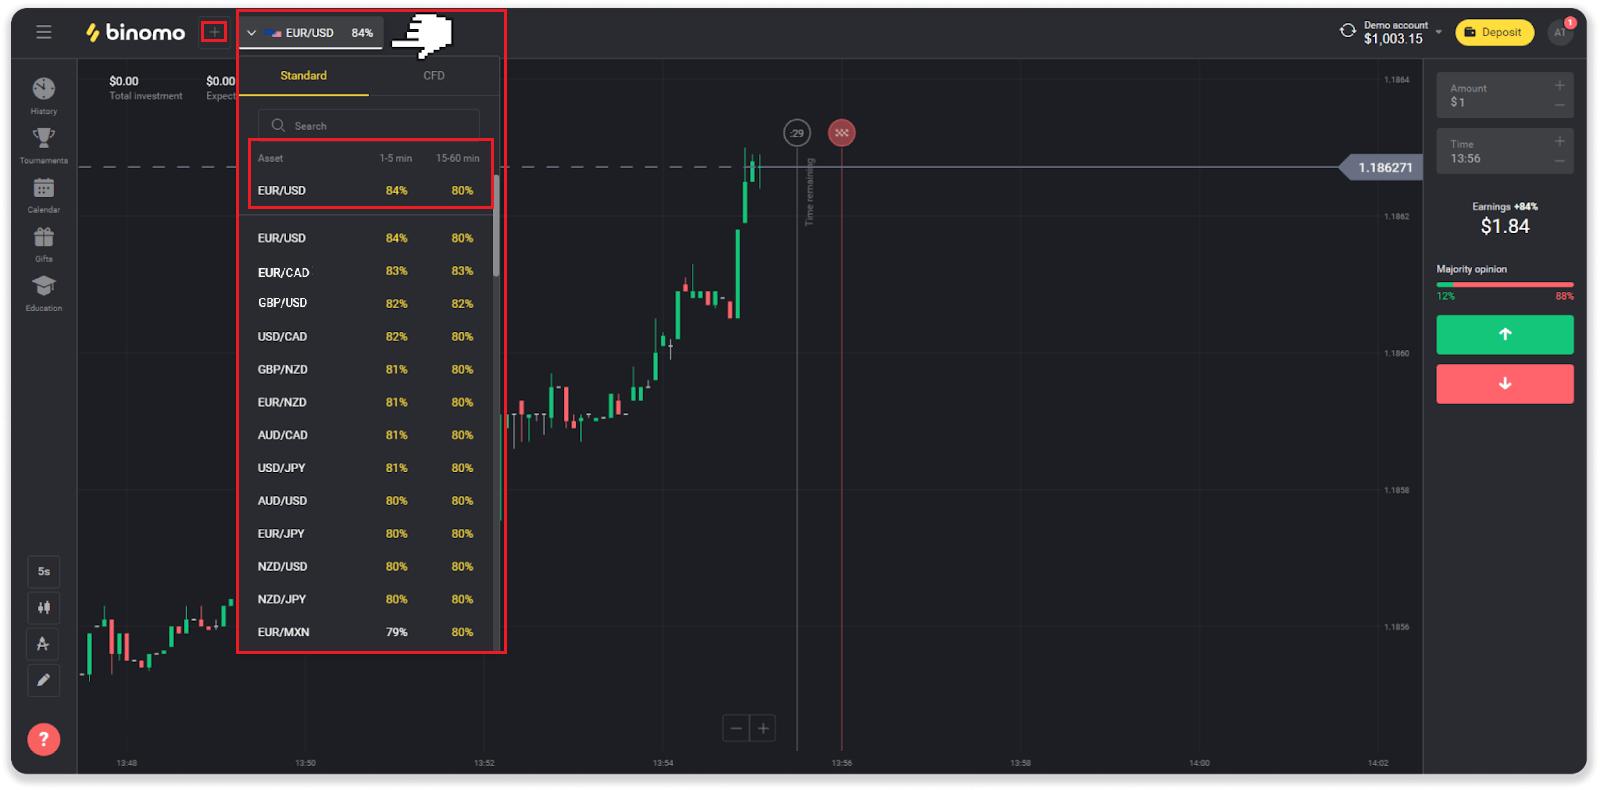 How to Login and start Trading at Binomo